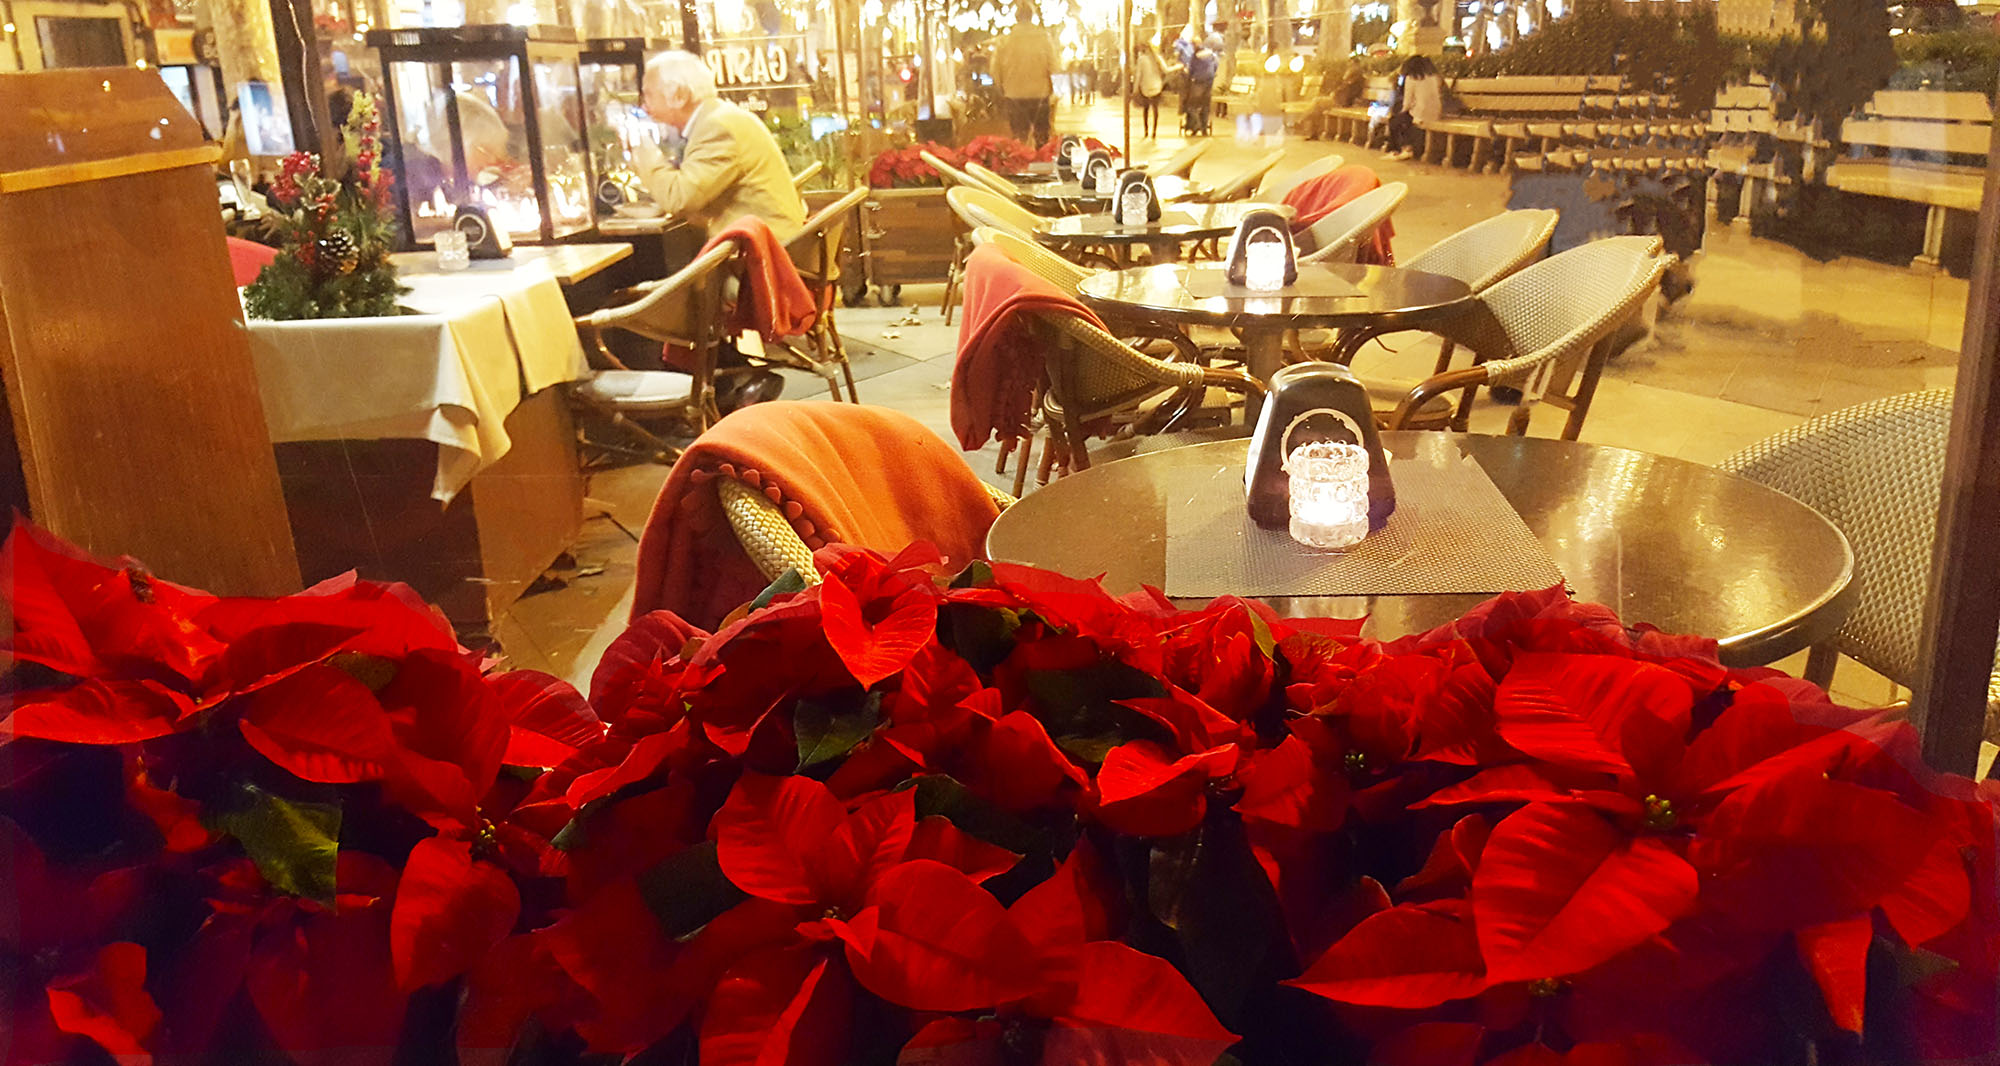 Poinsettia and cafe.jpg